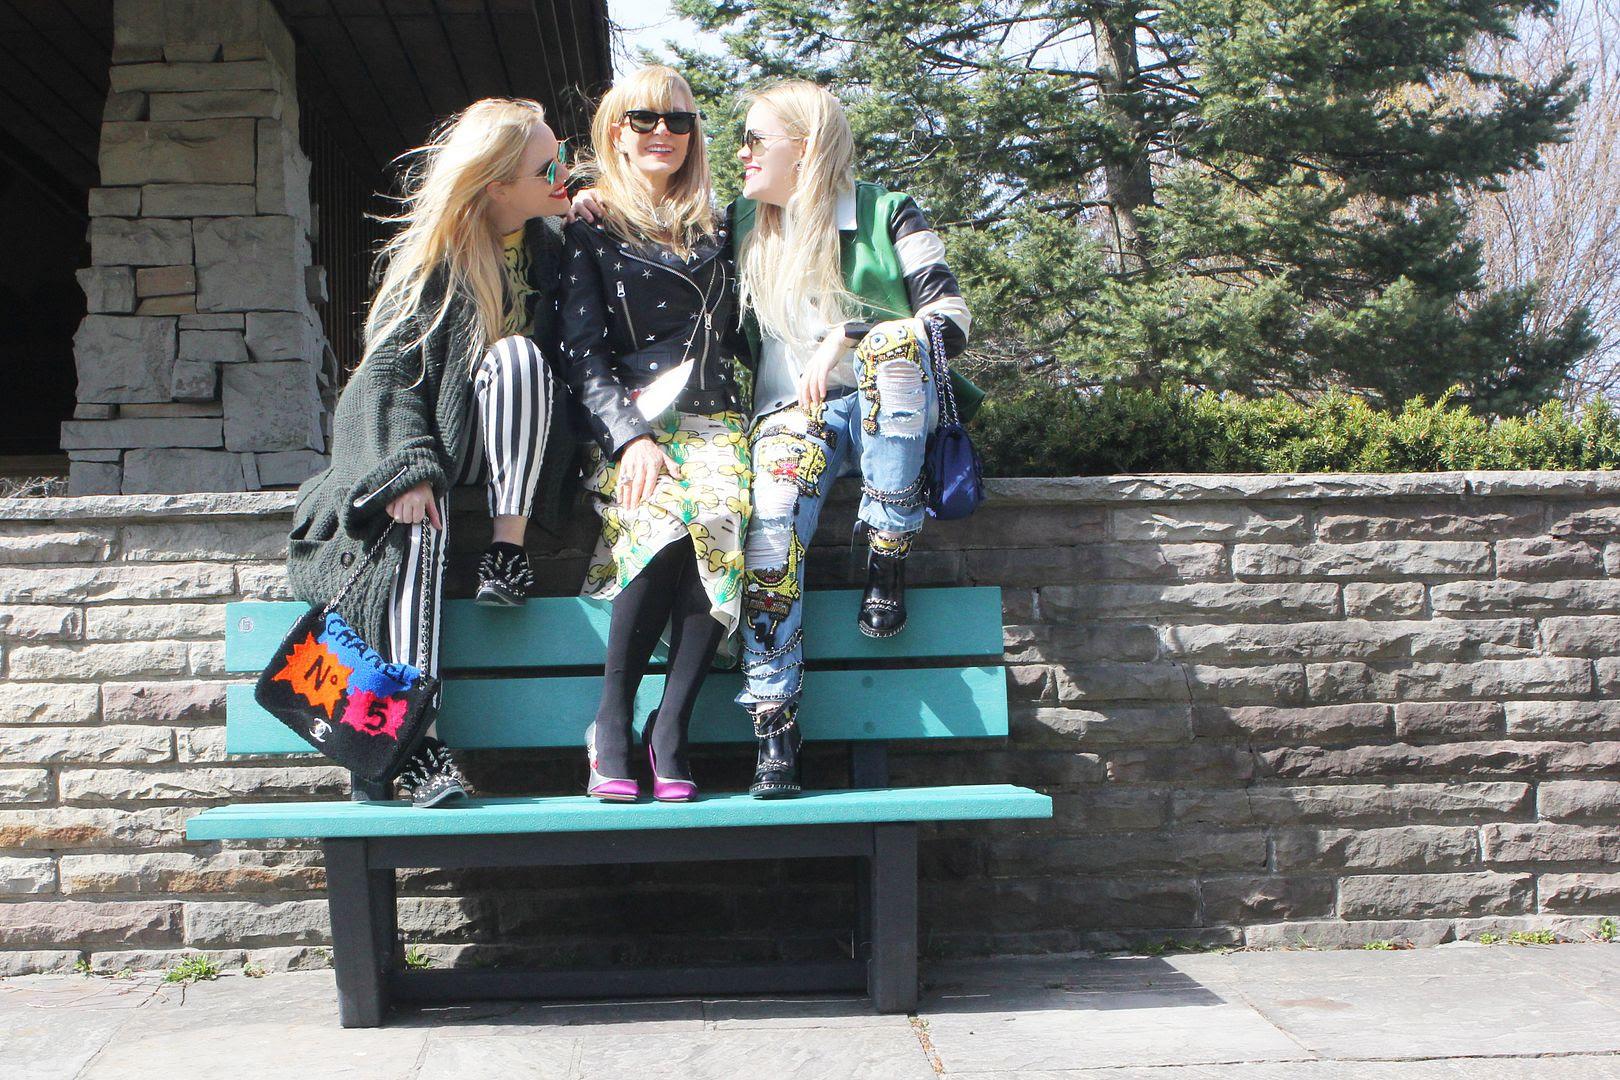 photo momday-mothersday-beckermans-sisters-momanddaughter-streetstyle-raybans-itstartedwithmom-sunglasshut-mothersday_zpsdig2aulu.jpg